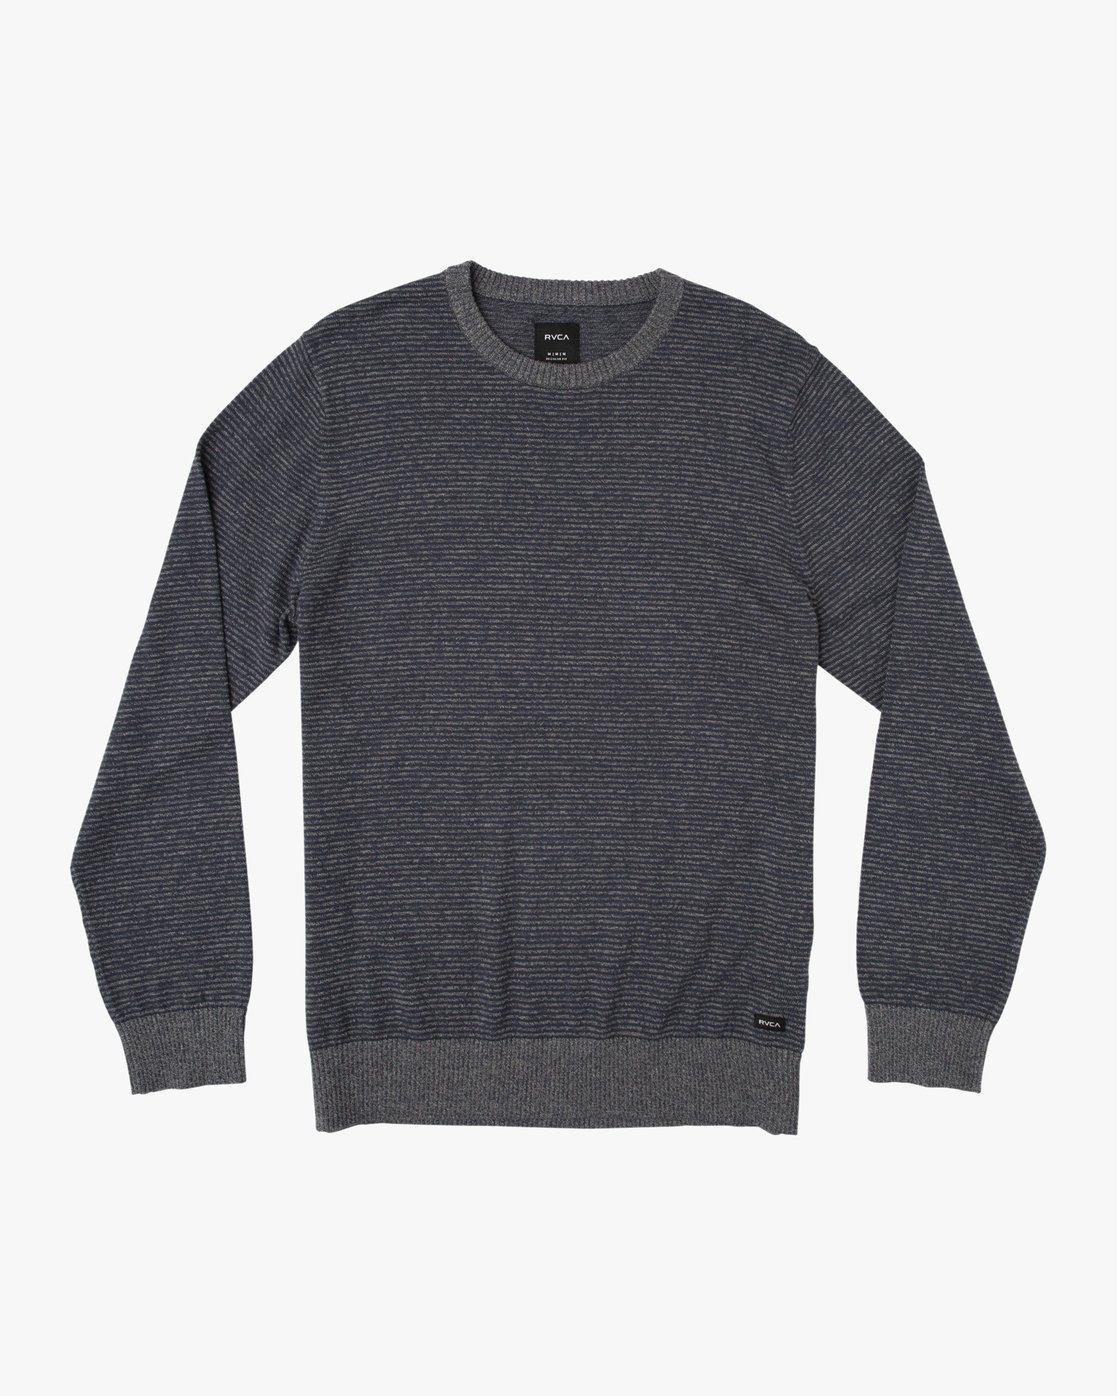 0 Layback Striped Sweater Grey MV42SRLB RVCA